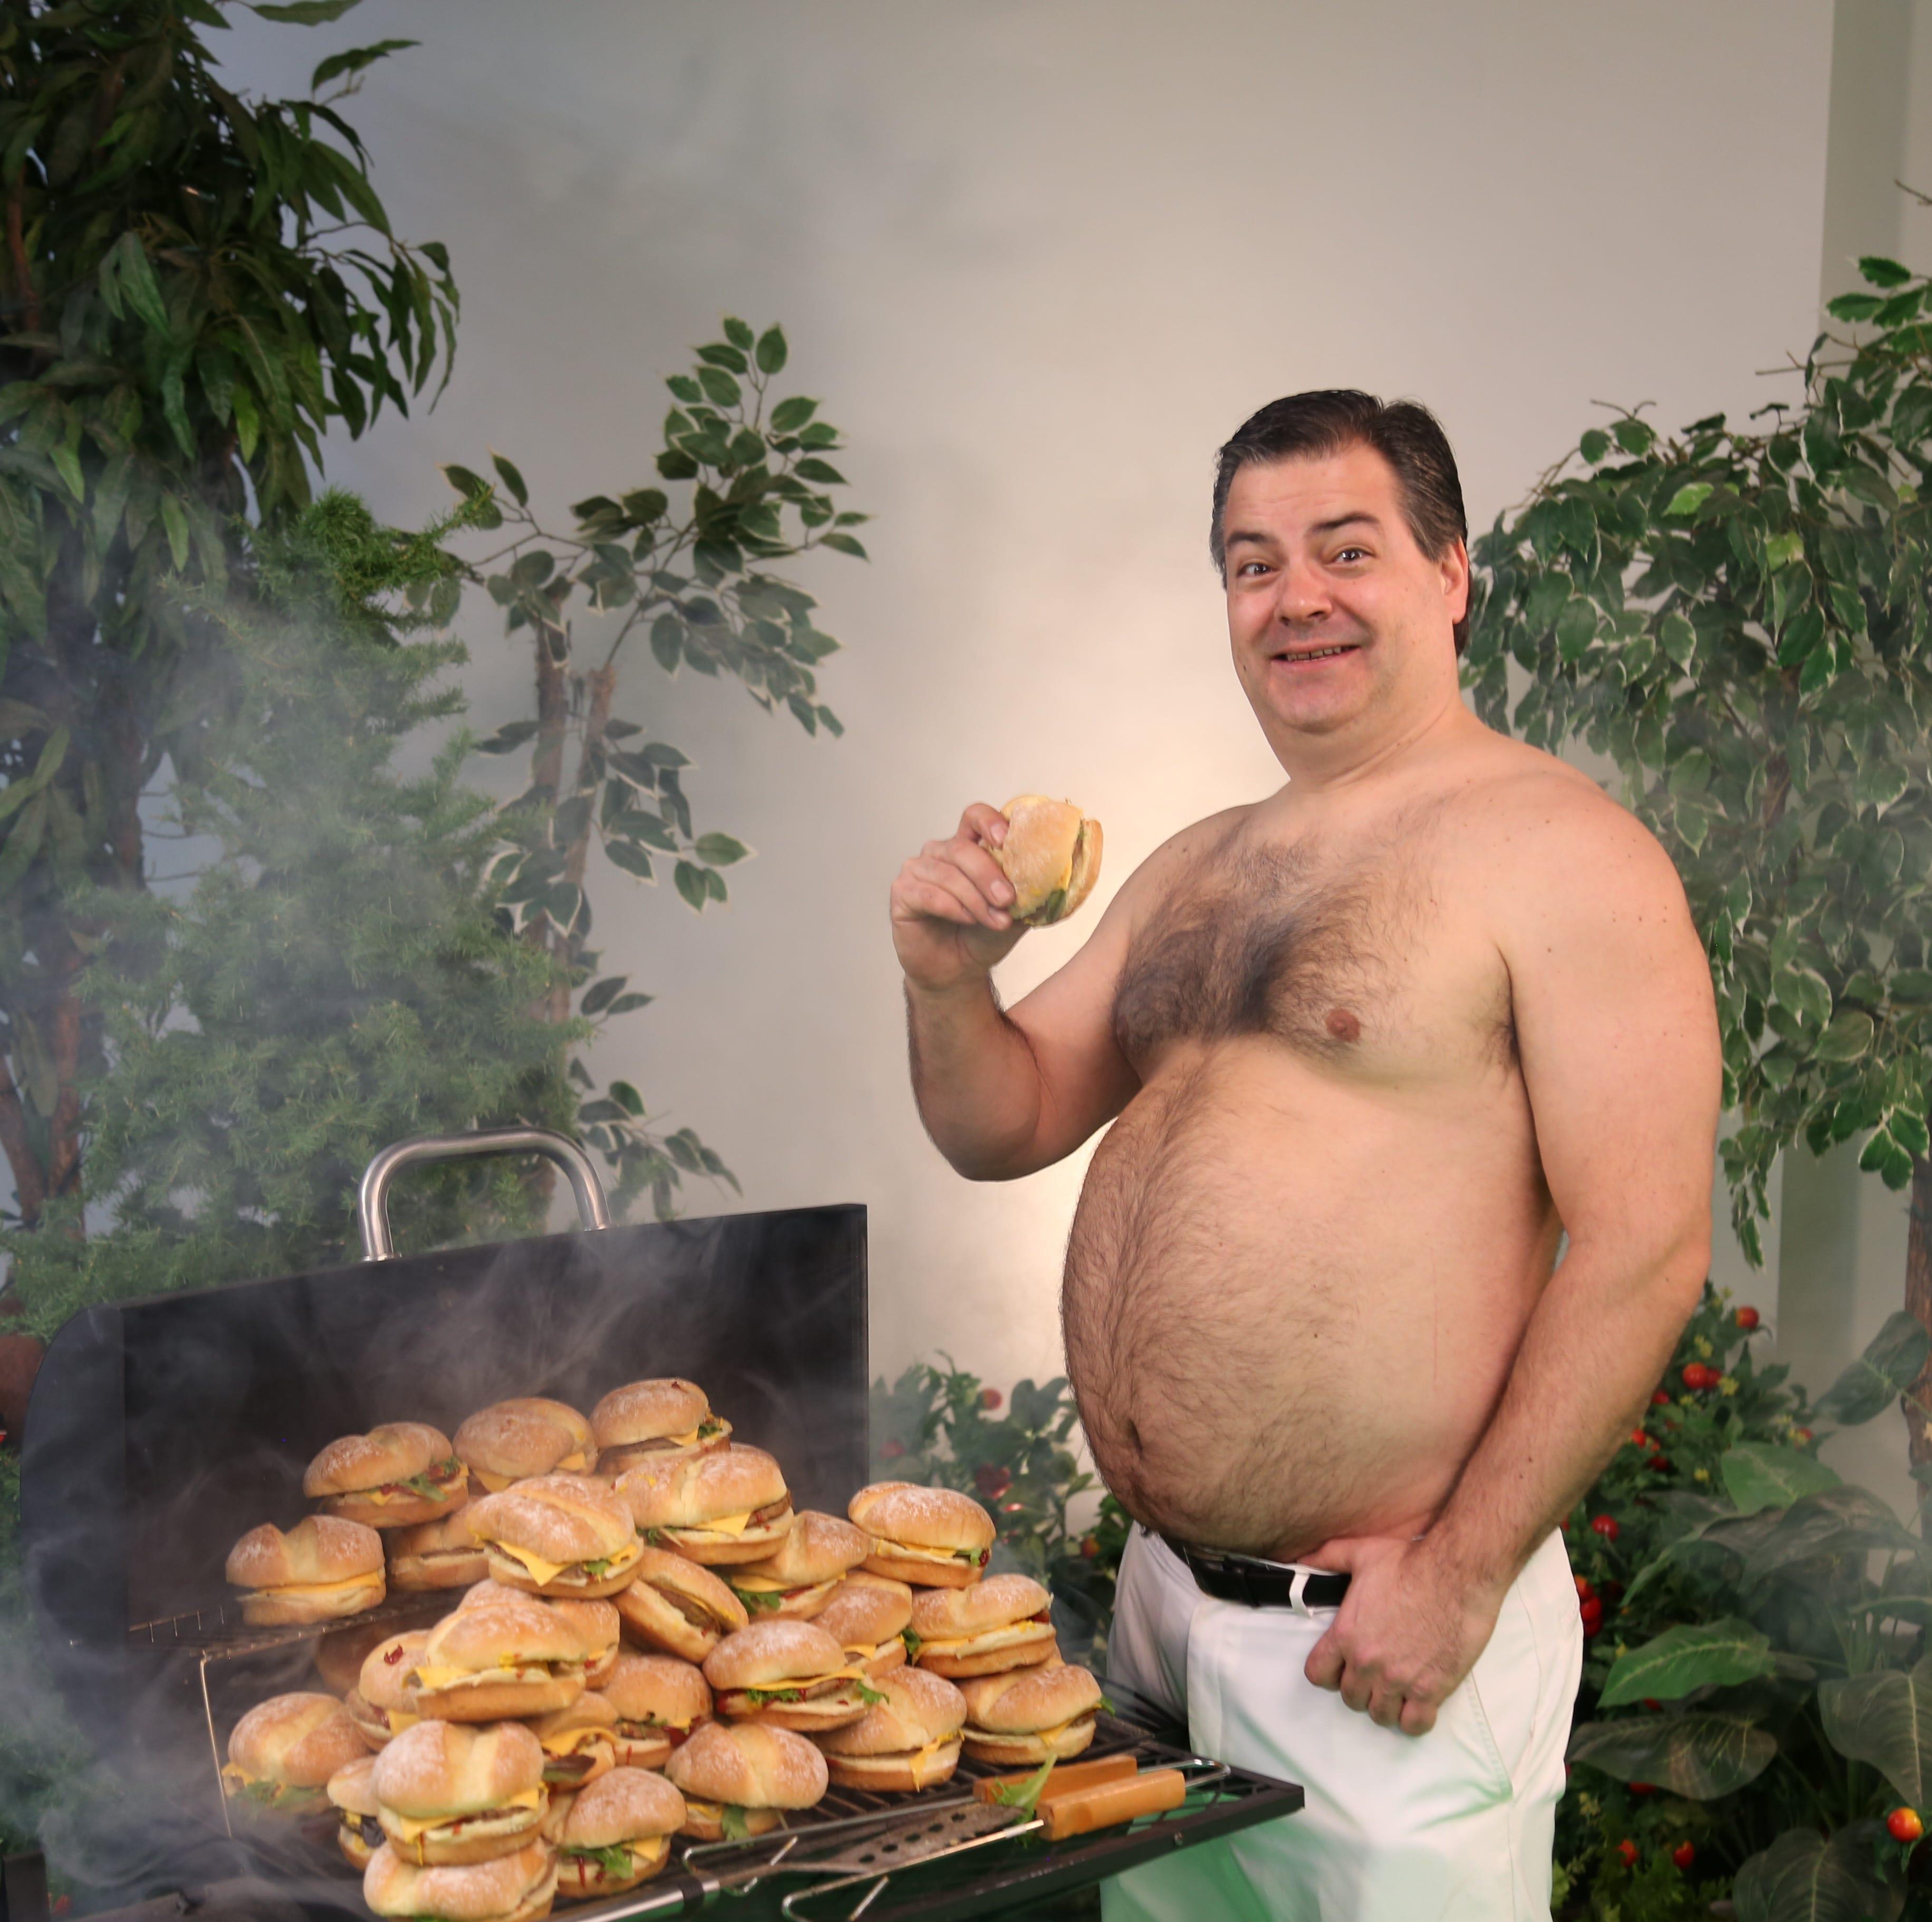 Who wants a cheeseburger? Randy from 'Trailer Park Boys' to visit Bigs Bar